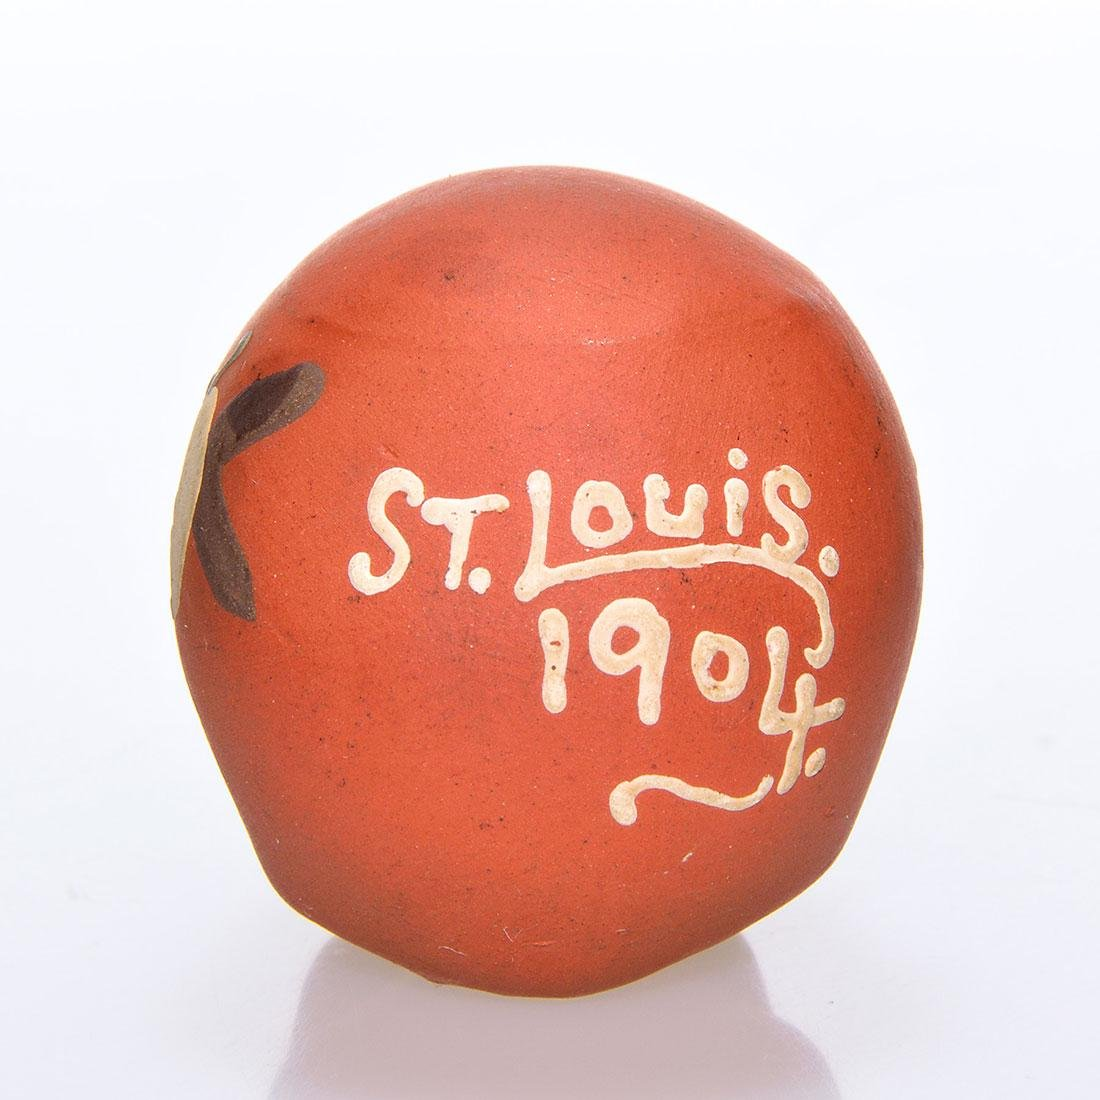 Weller St. Louis Worlds Fair decorated skull,1904,1 5/8 - 2